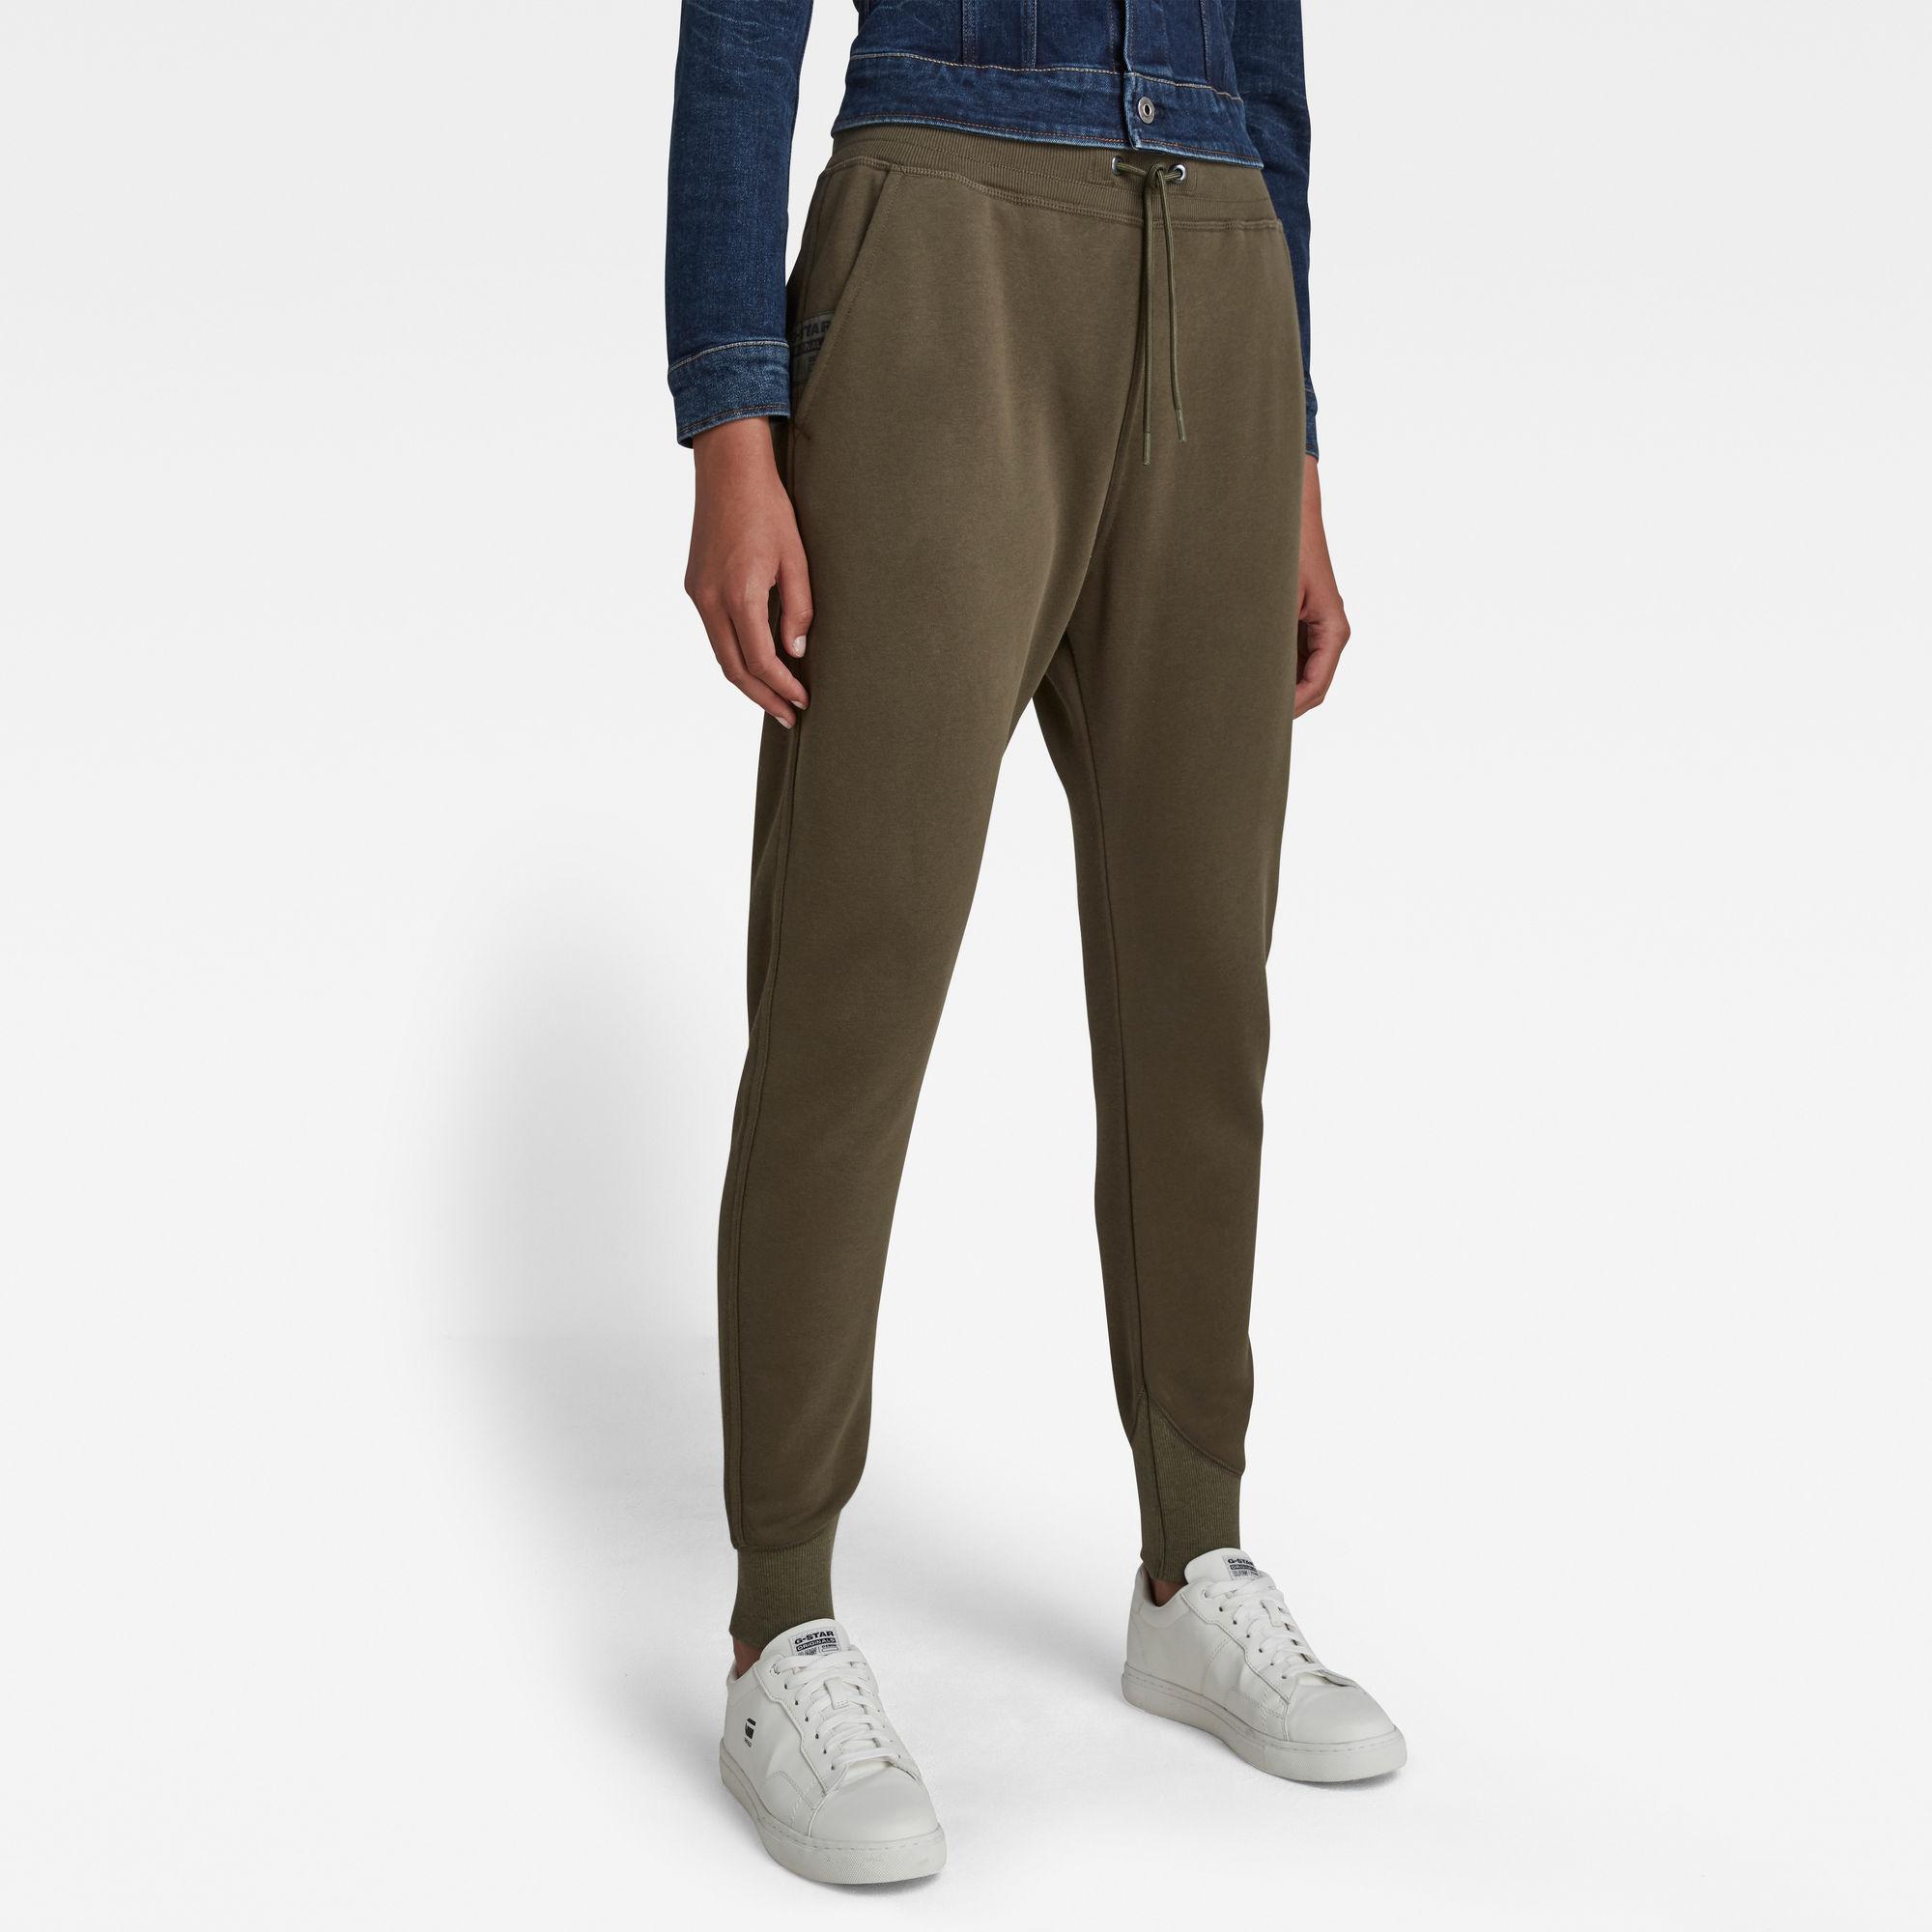 G-Star RAW Dames Premium core 3D Tapered Sweatpants Groen